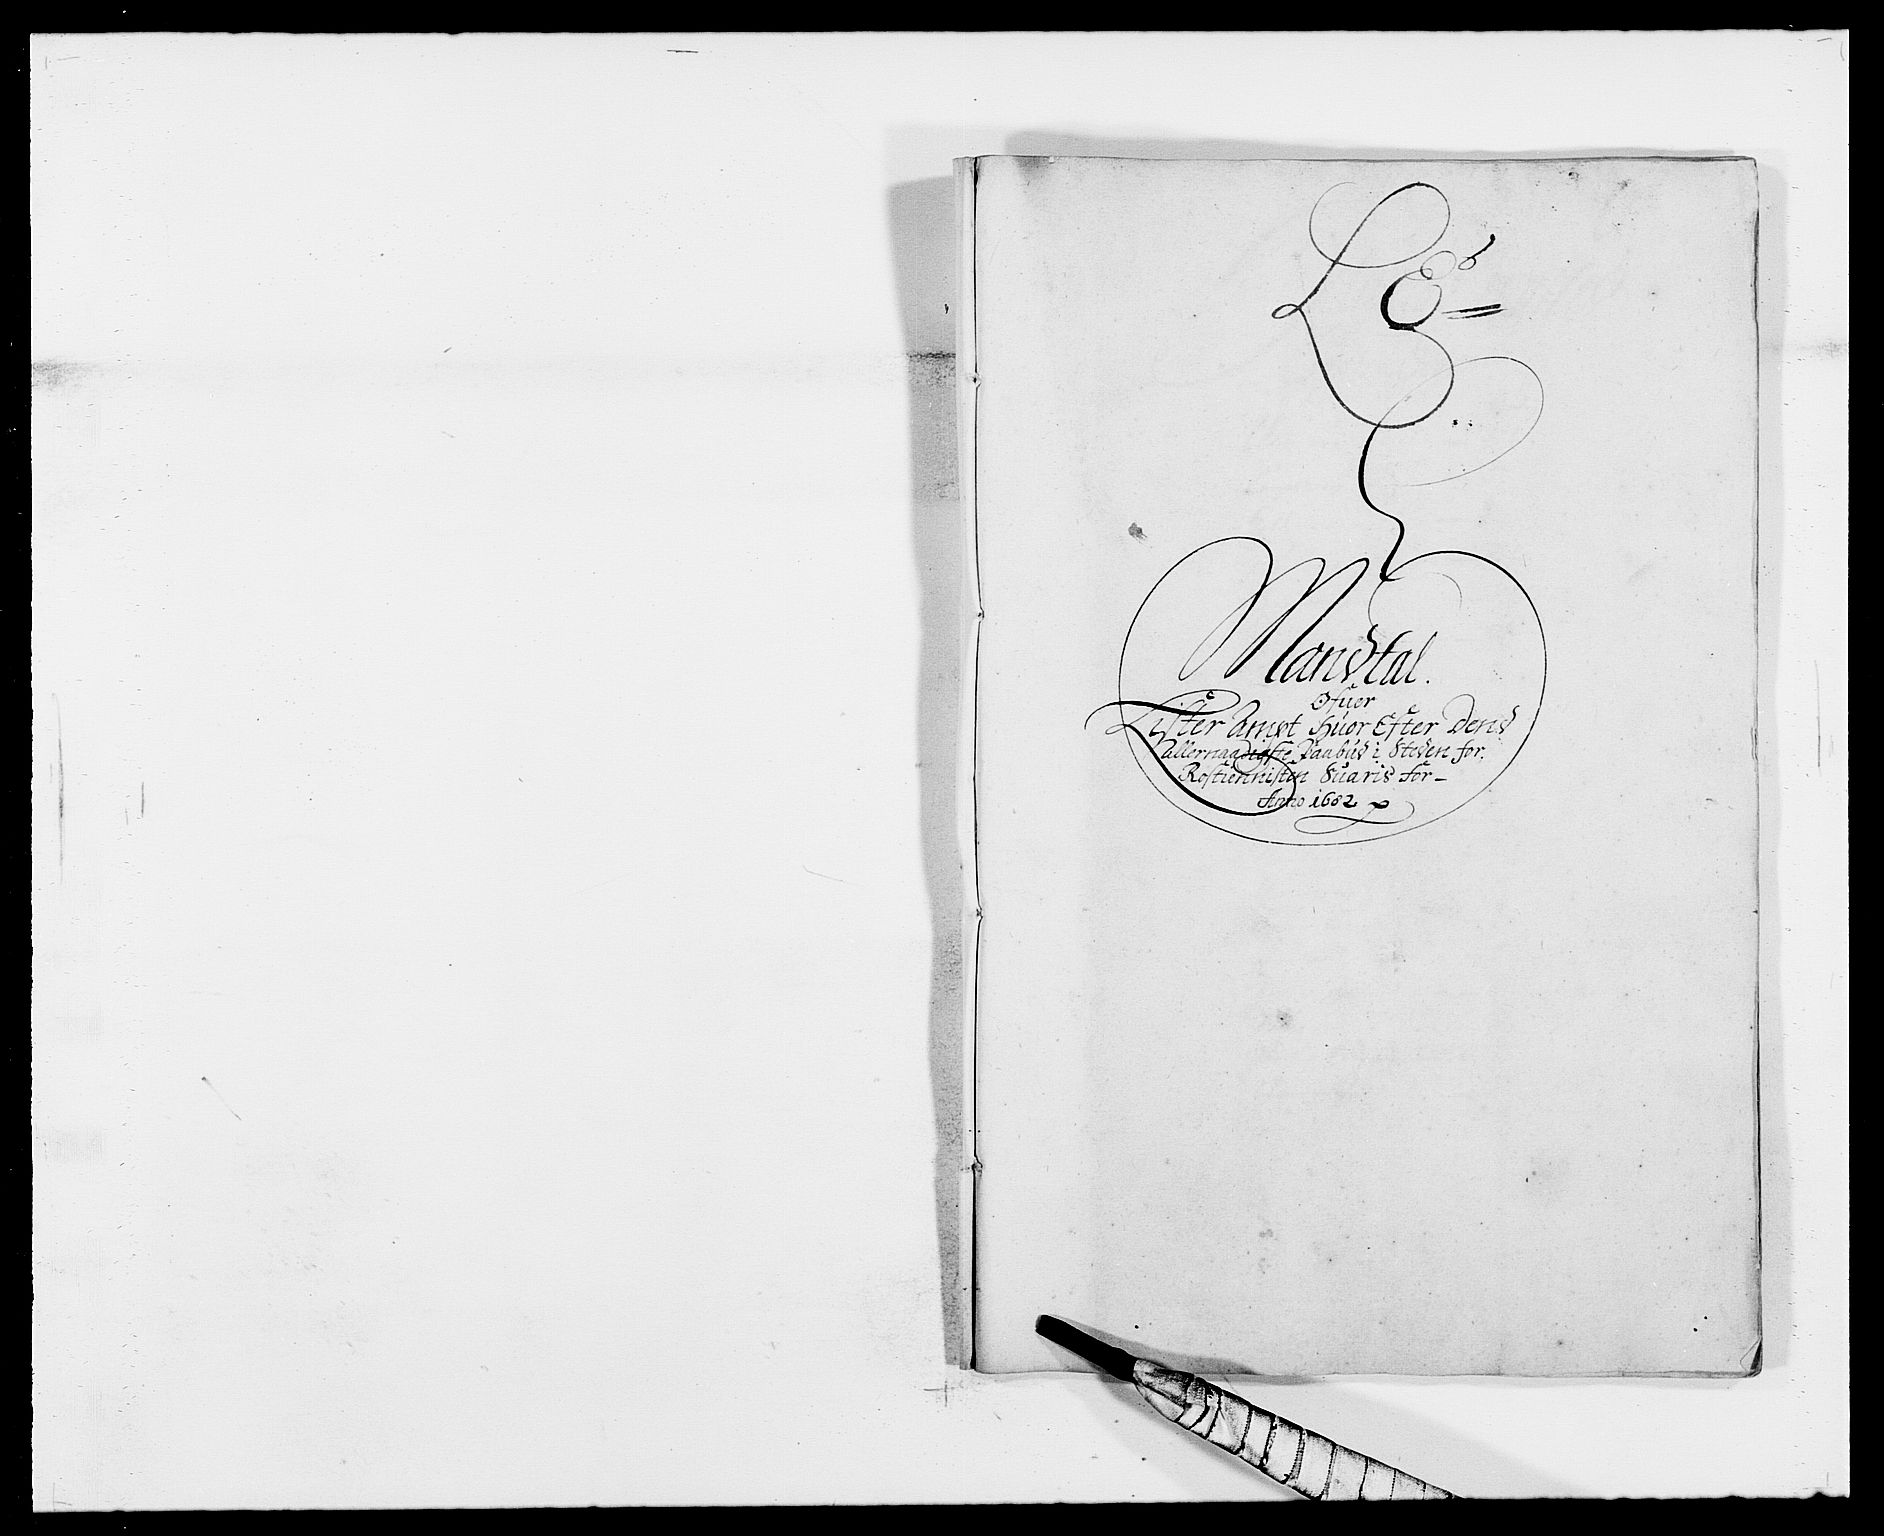 RA, Rentekammeret inntil 1814, Reviderte regnskaper, Fogderegnskap, R41/L2531: Fogderegnskap Lista, 1680-1682, s. 230